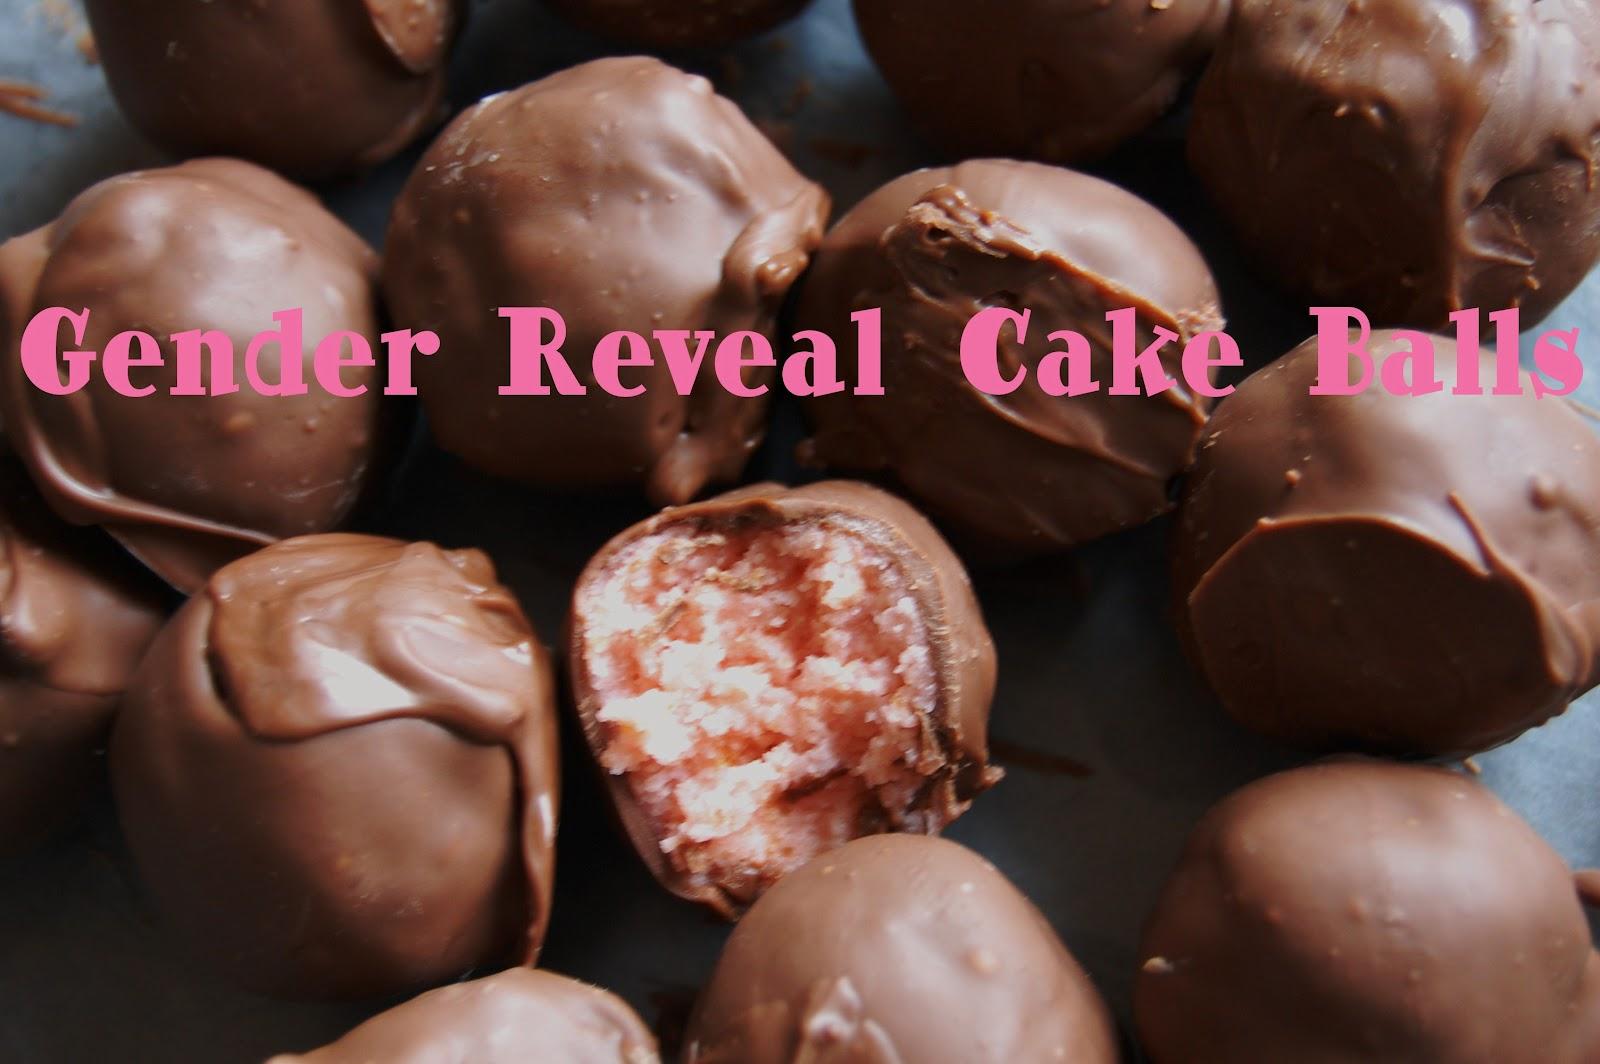 Gender Reveal Cake Balls - Wine & Glue